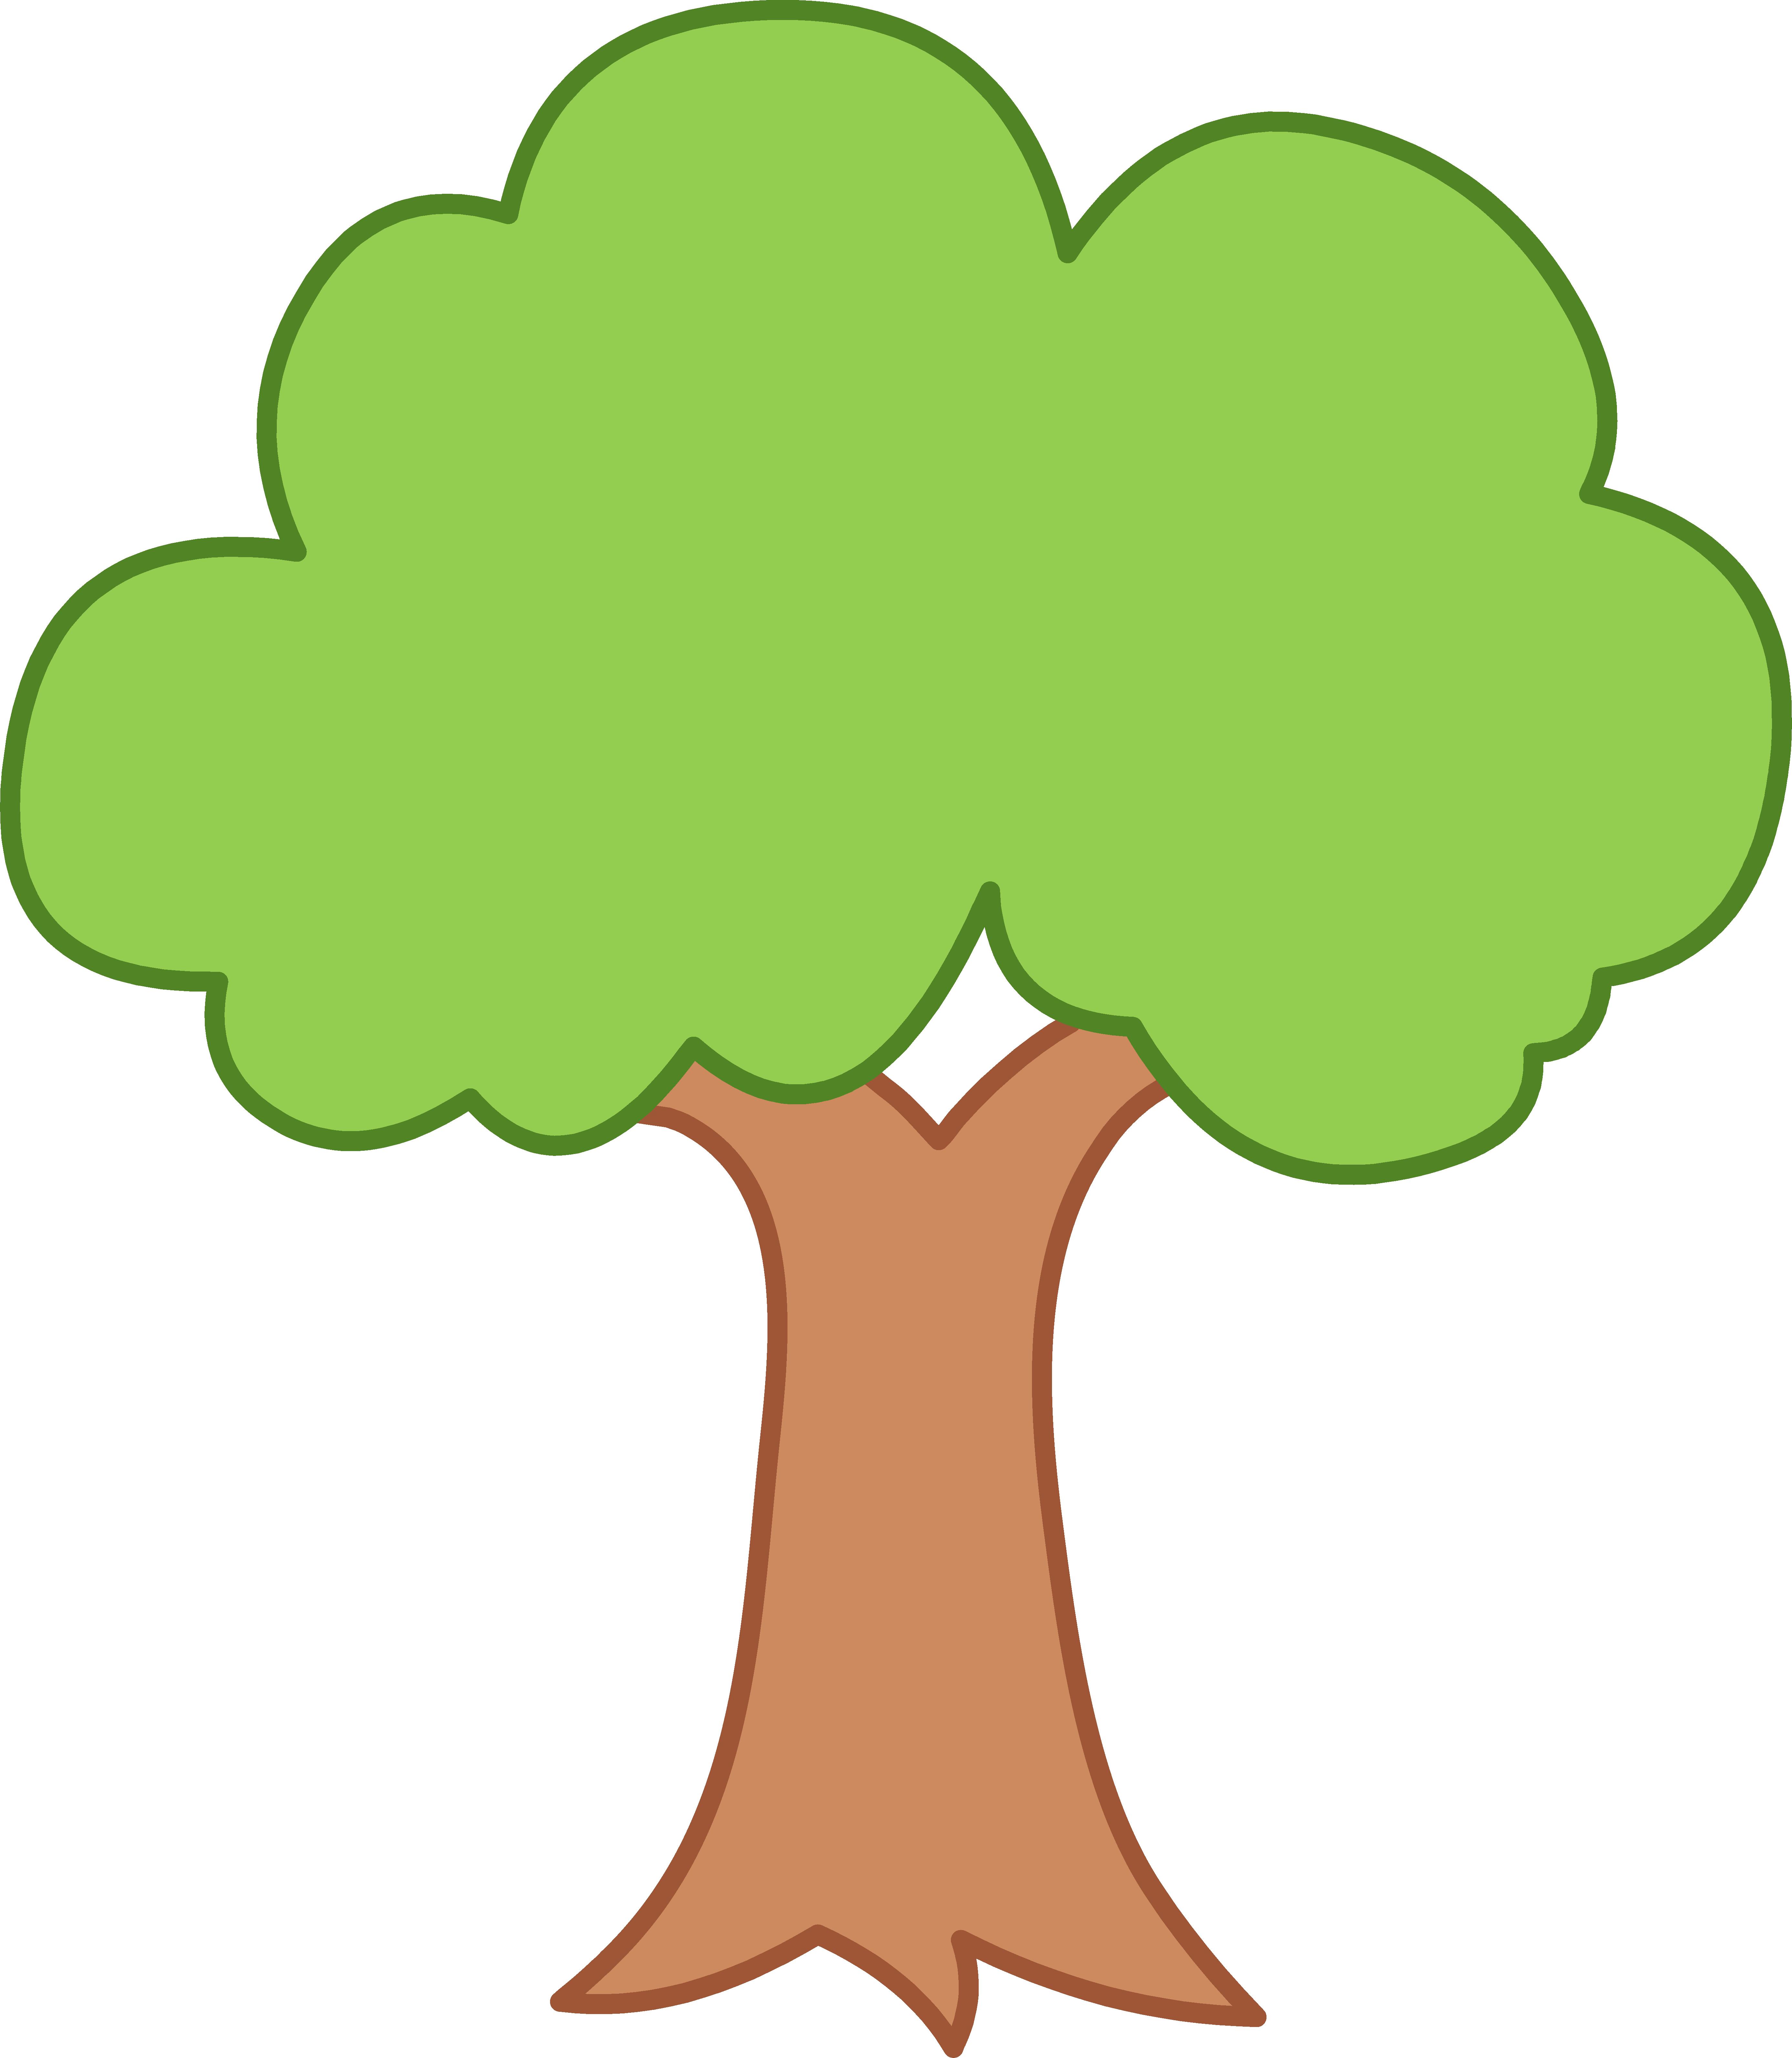 5548x6372 Simple Green Tree Design